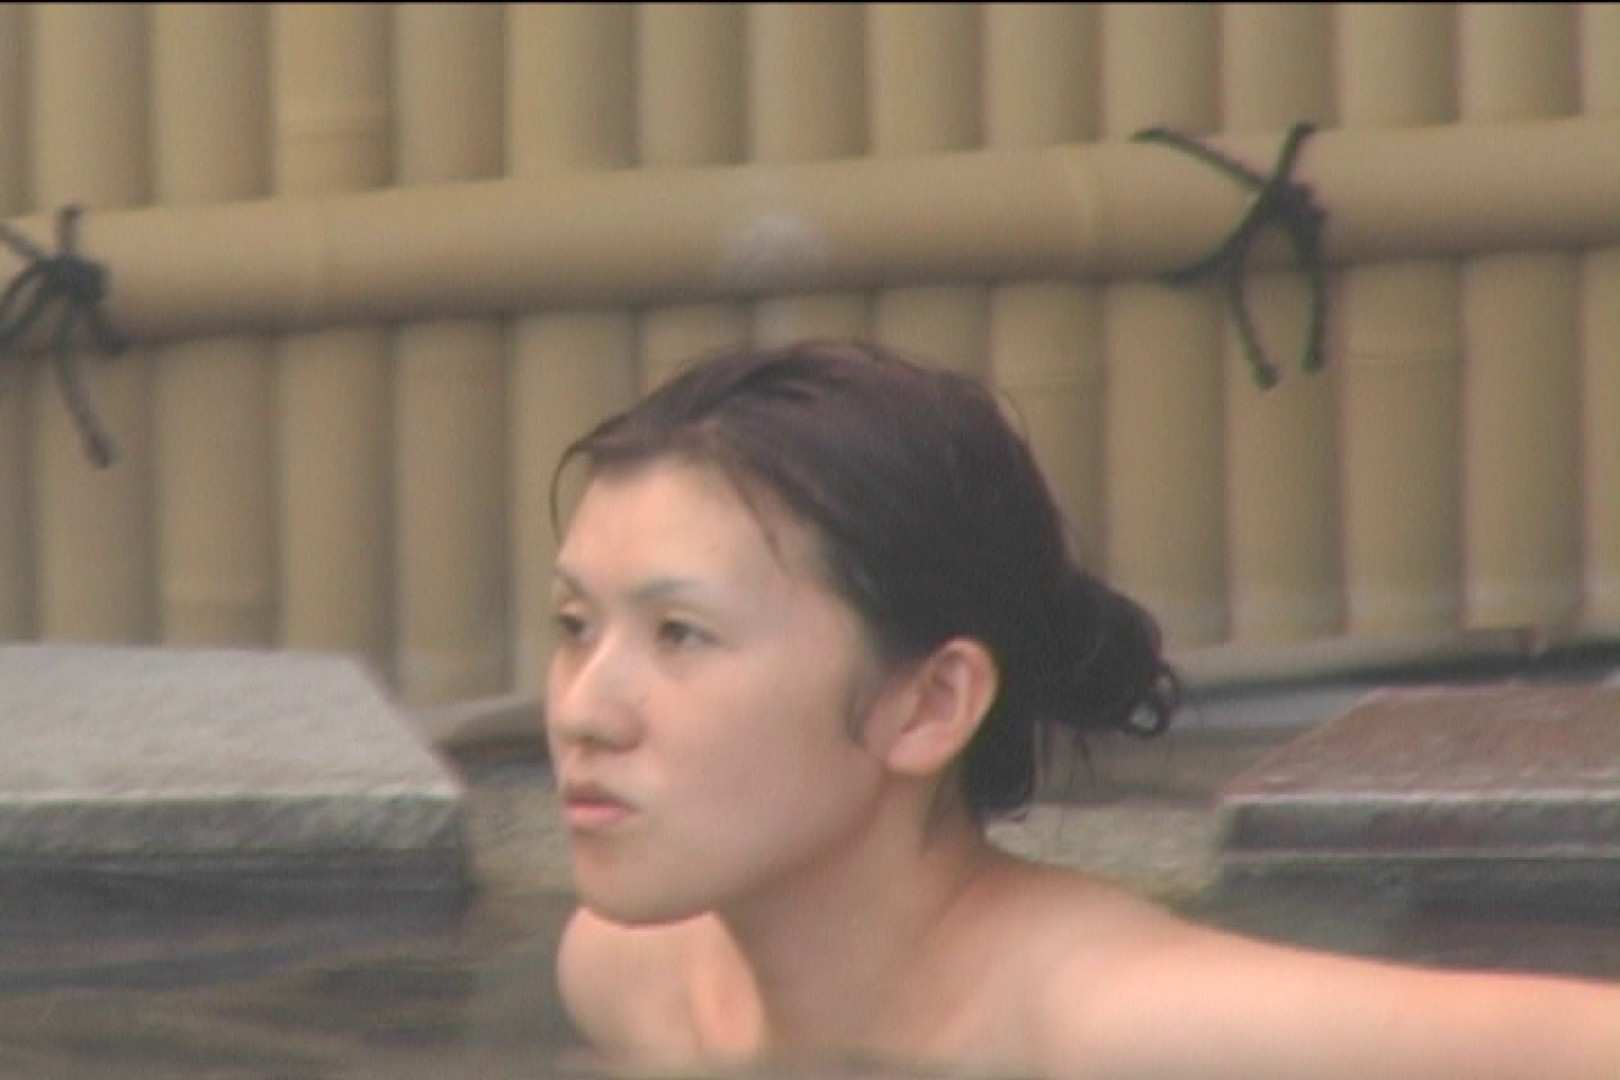 Aquaな露天風呂Vol.532 盗撮 | HなOL  65pic 24